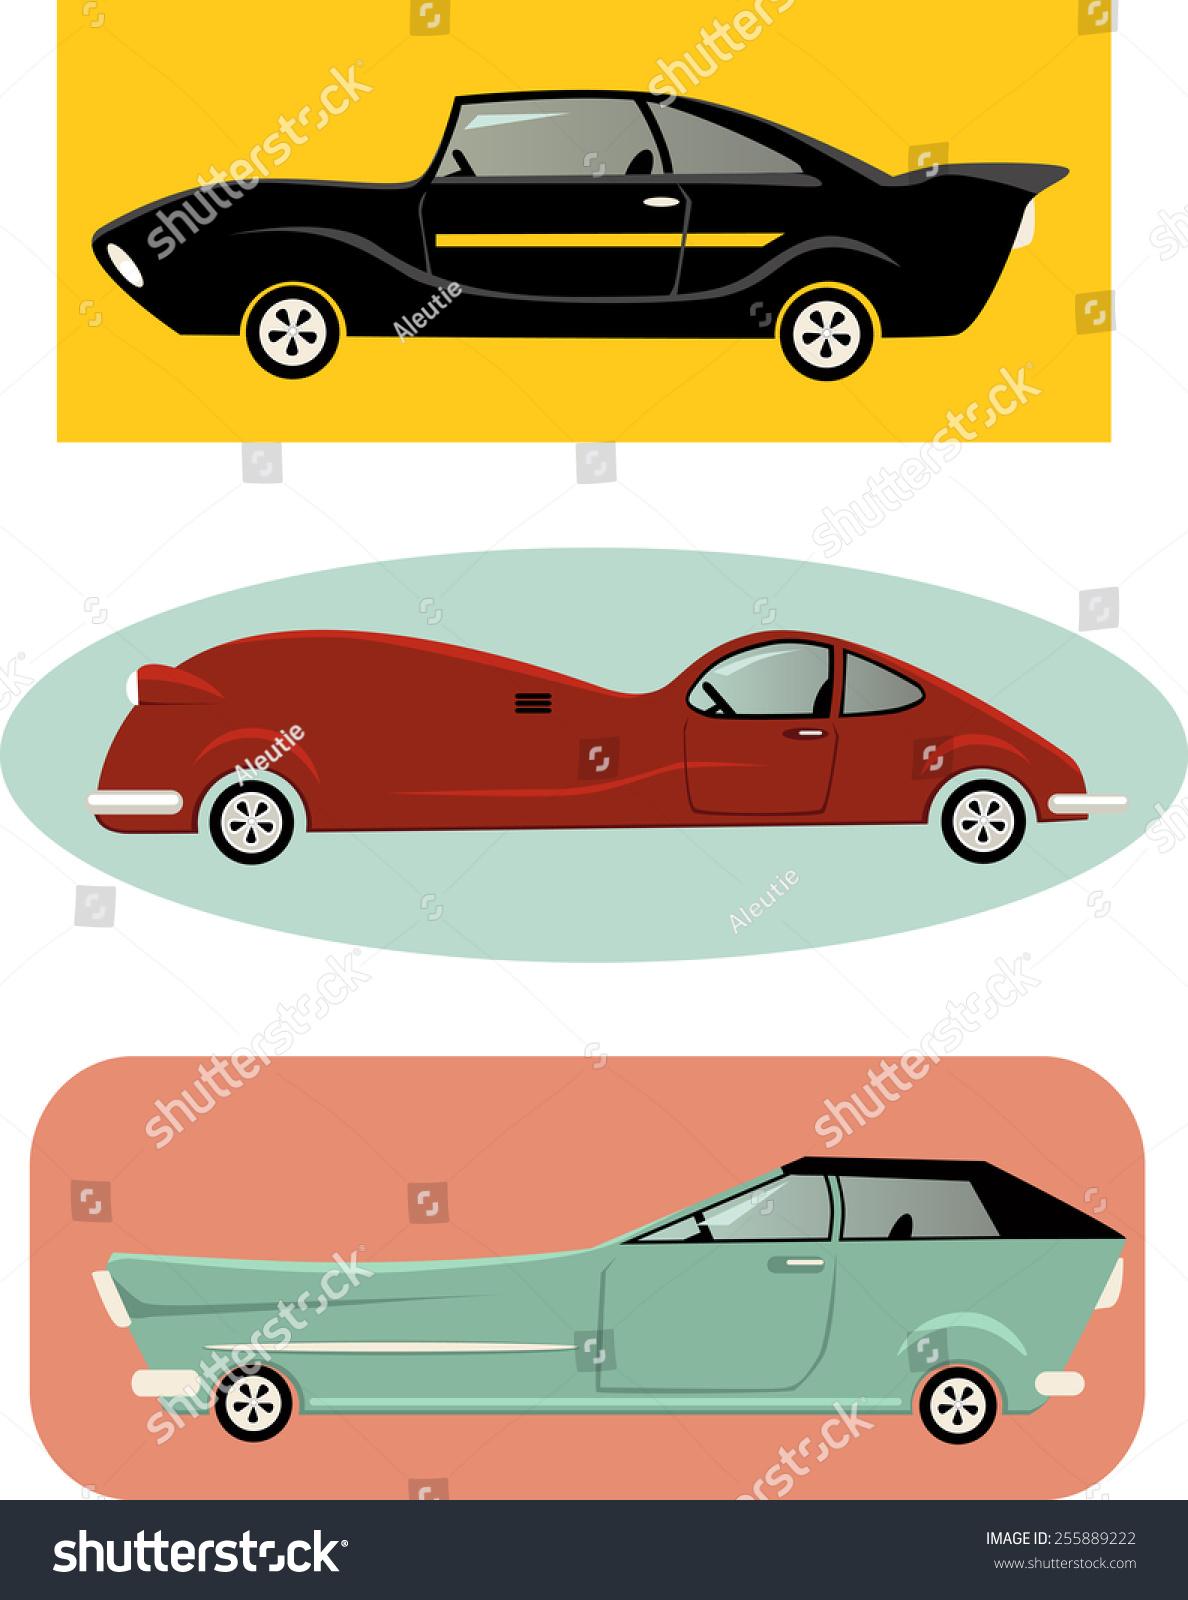 Set Vintageinspired Cartoon Muscle Cars Vector Stock Vector